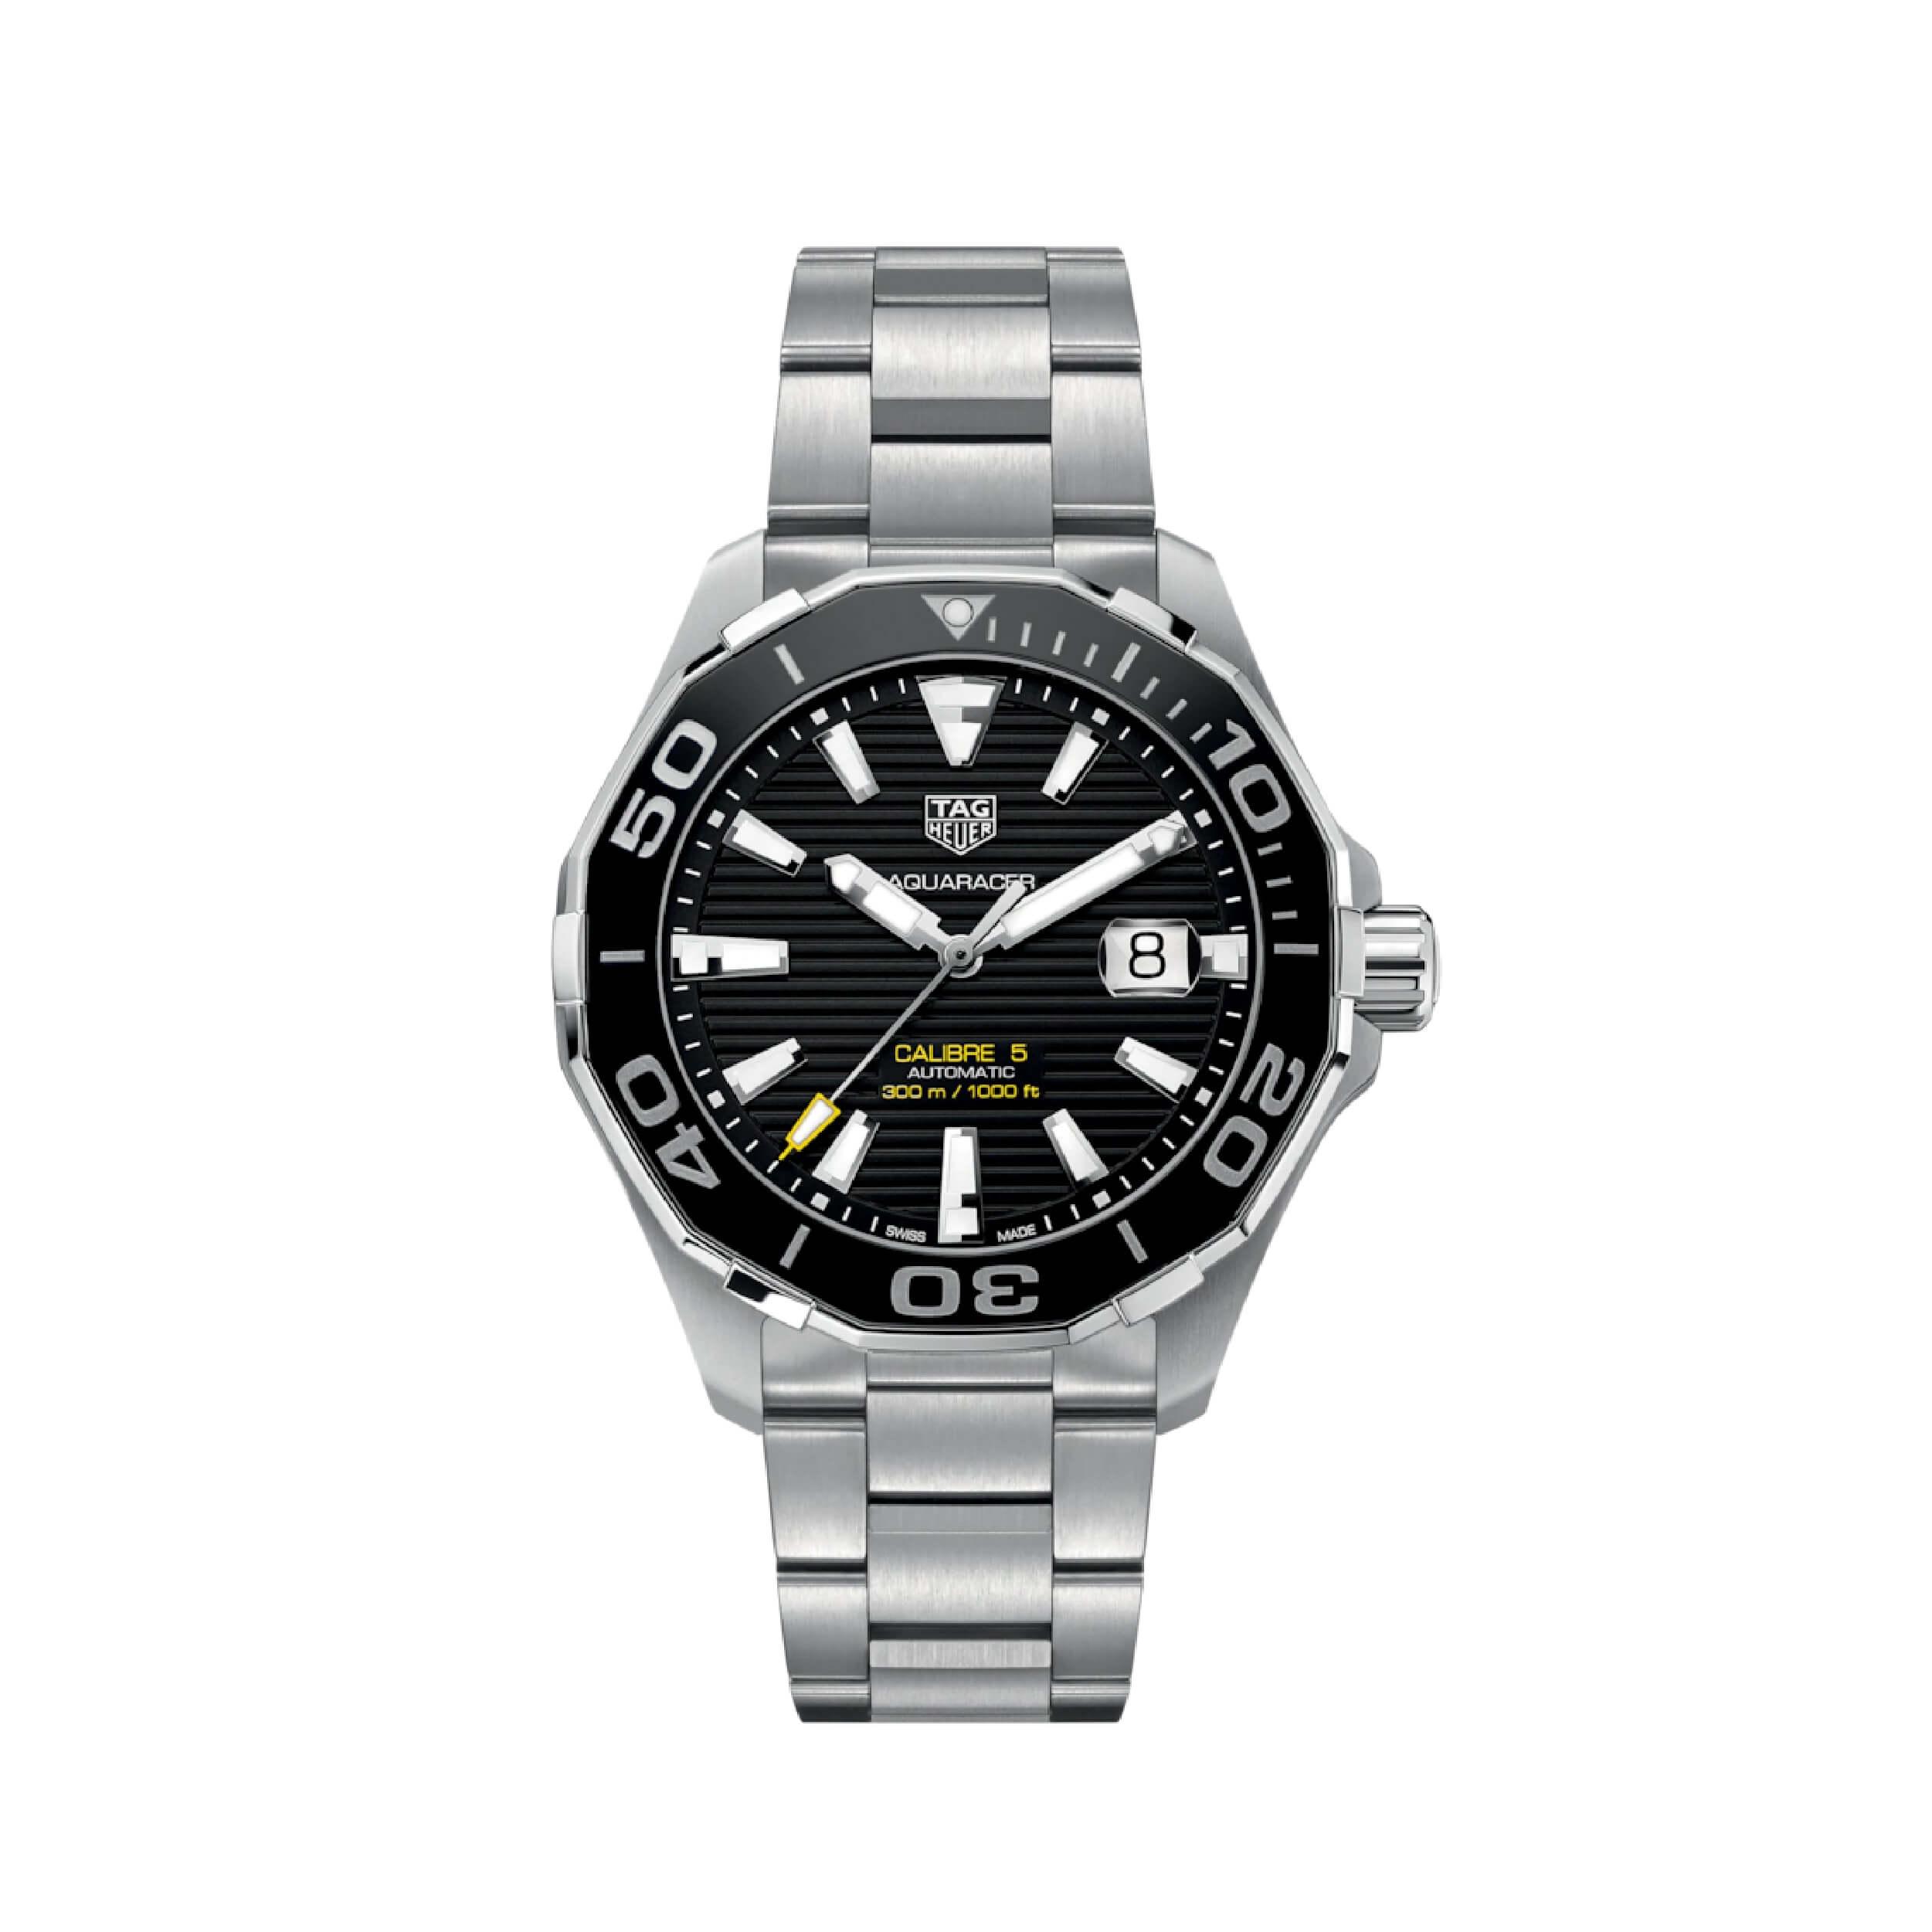 Tag Heuer Aquaracer Calibre 5 | Wristwatches360